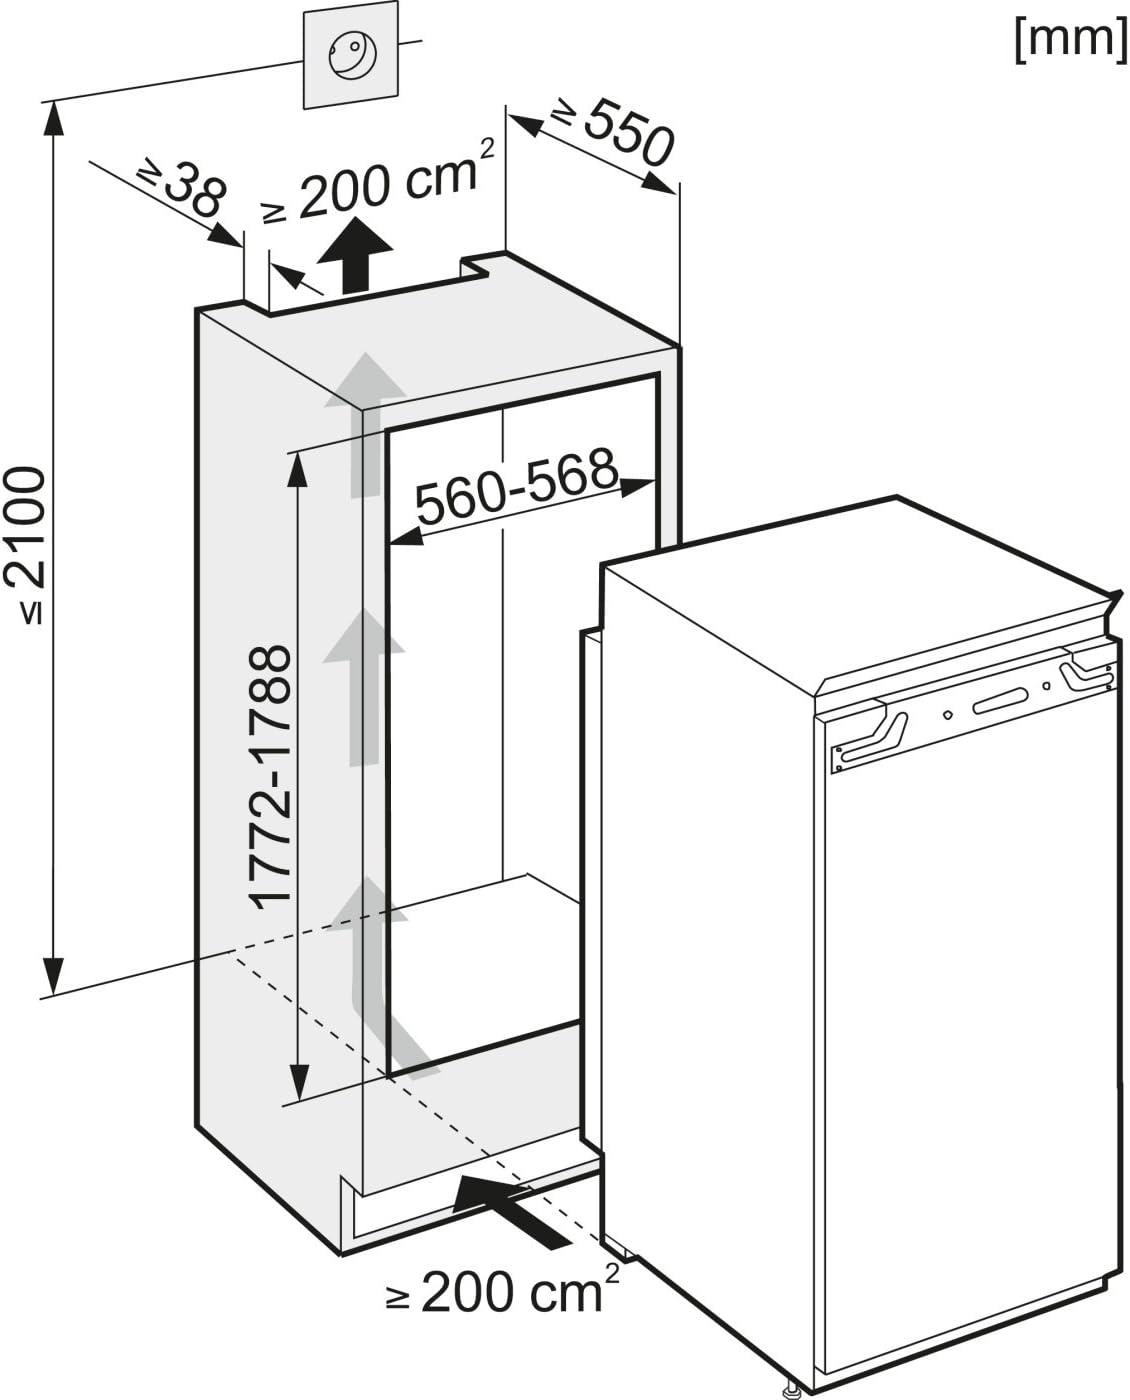 Miele FN 9752 i, 230-240 V, 50 Hz, A+, 325 kWh/year, 38 Db, Blanco ...